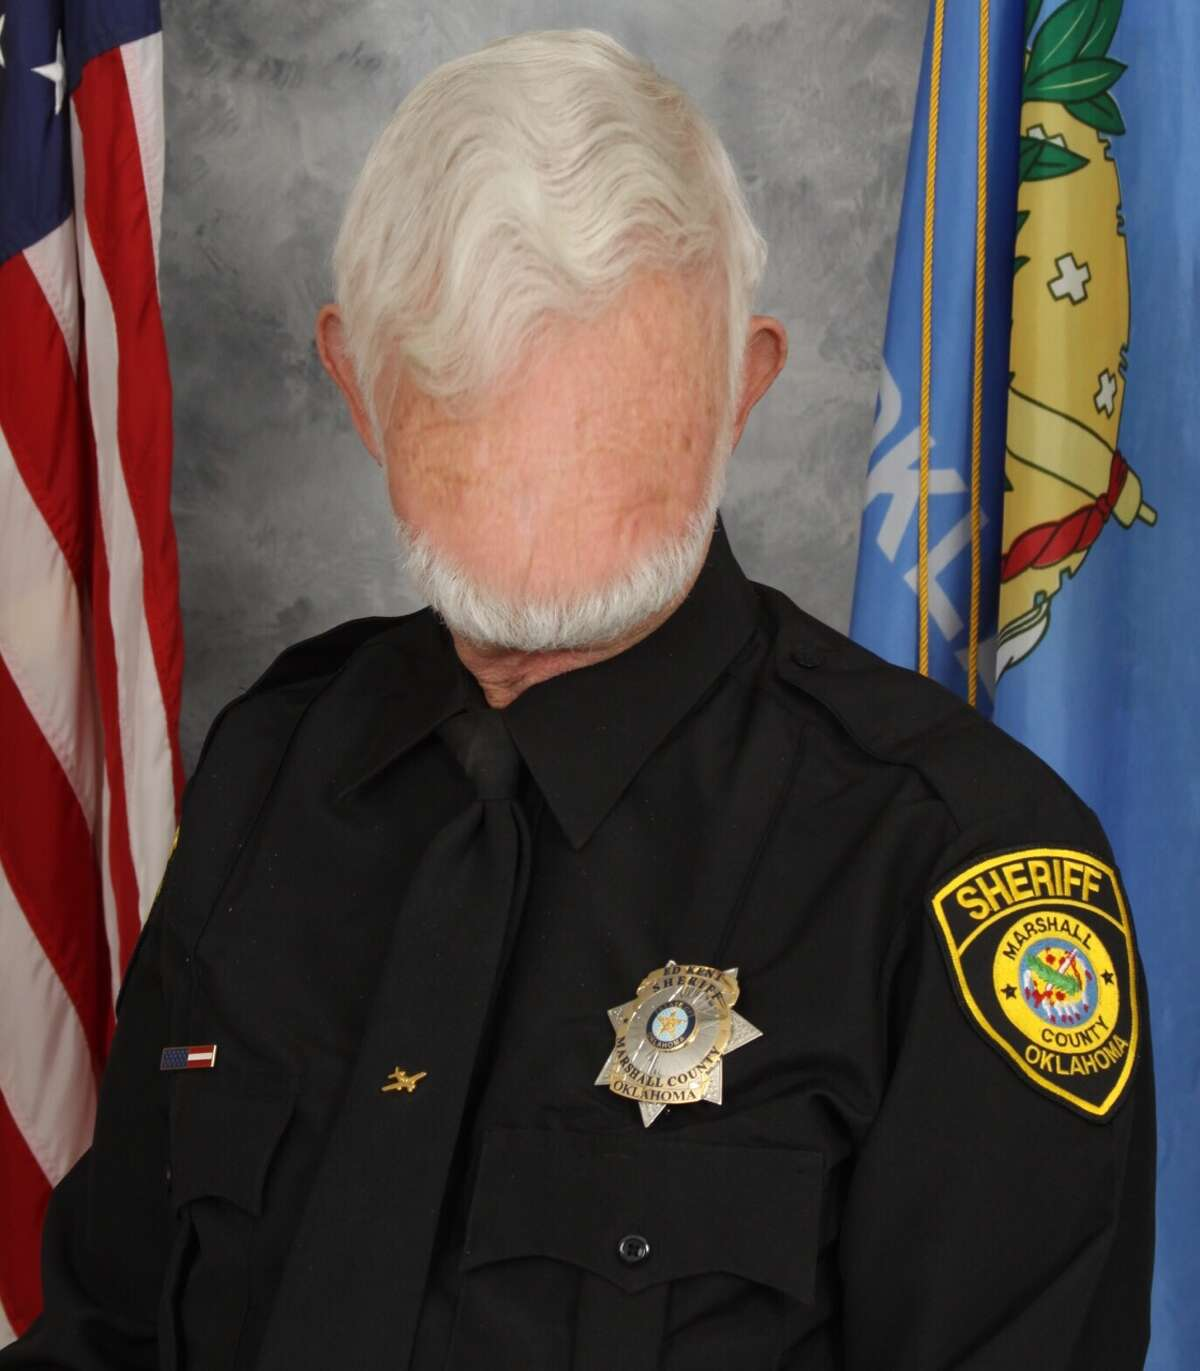 Unidentified cop